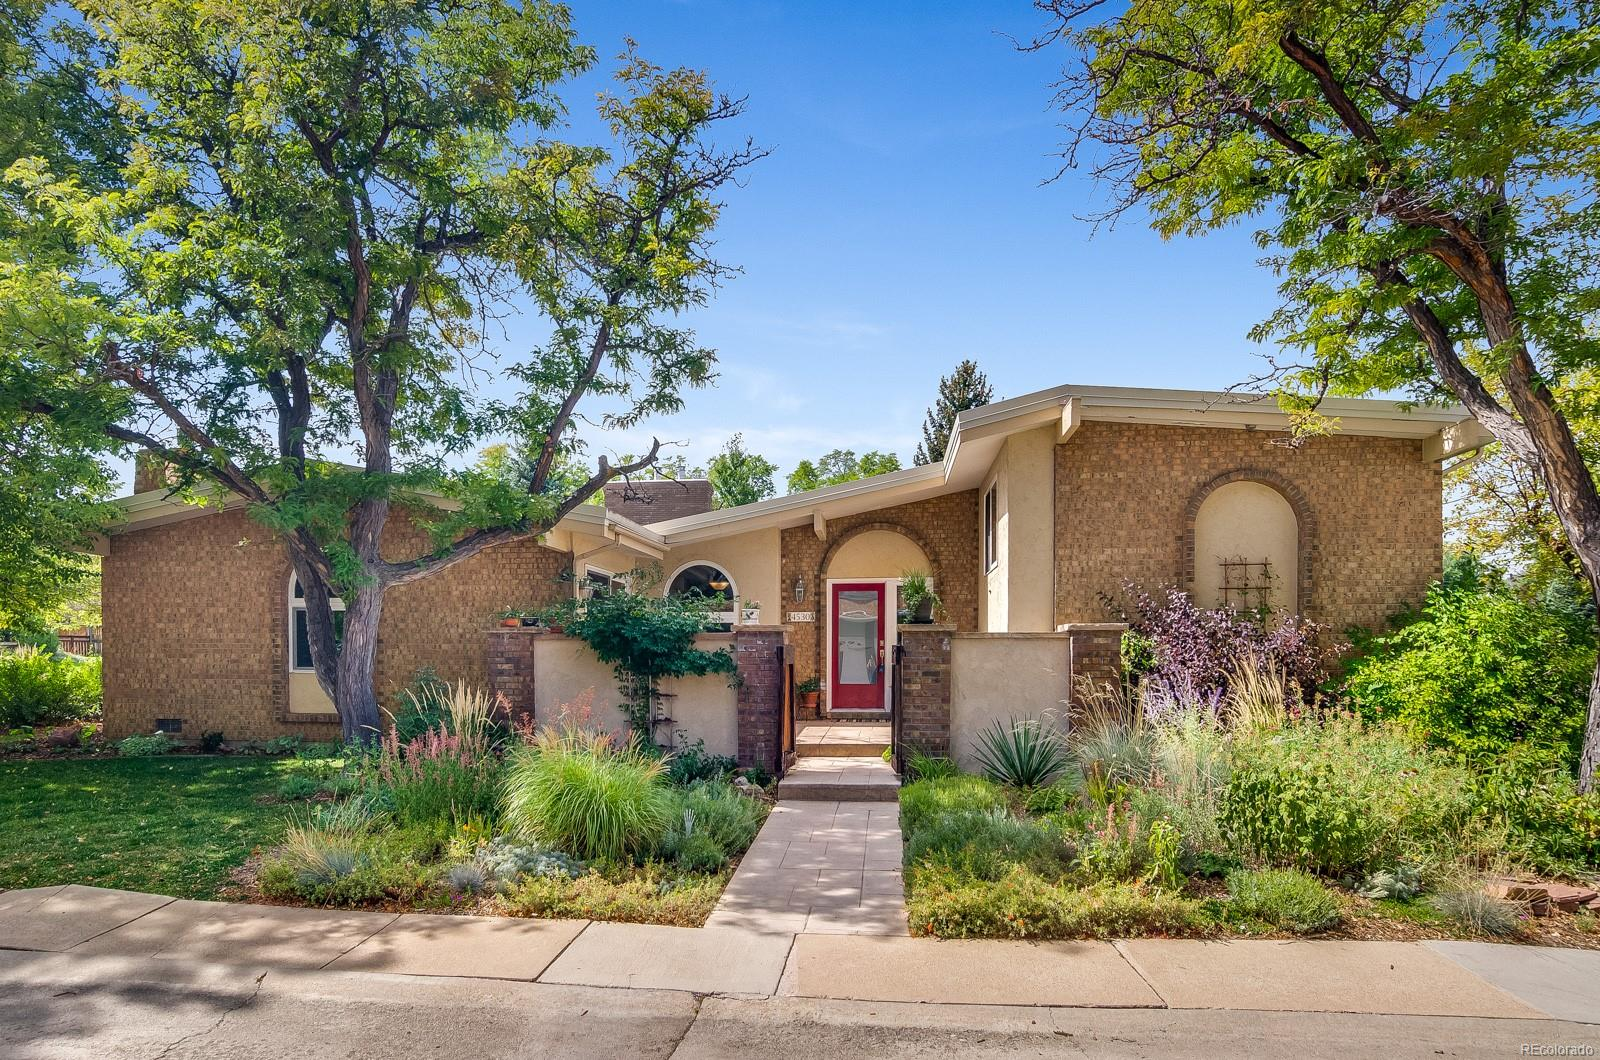 4530 Sioux Drive, Boulder, CO 80303 - Boulder, CO real estate listing